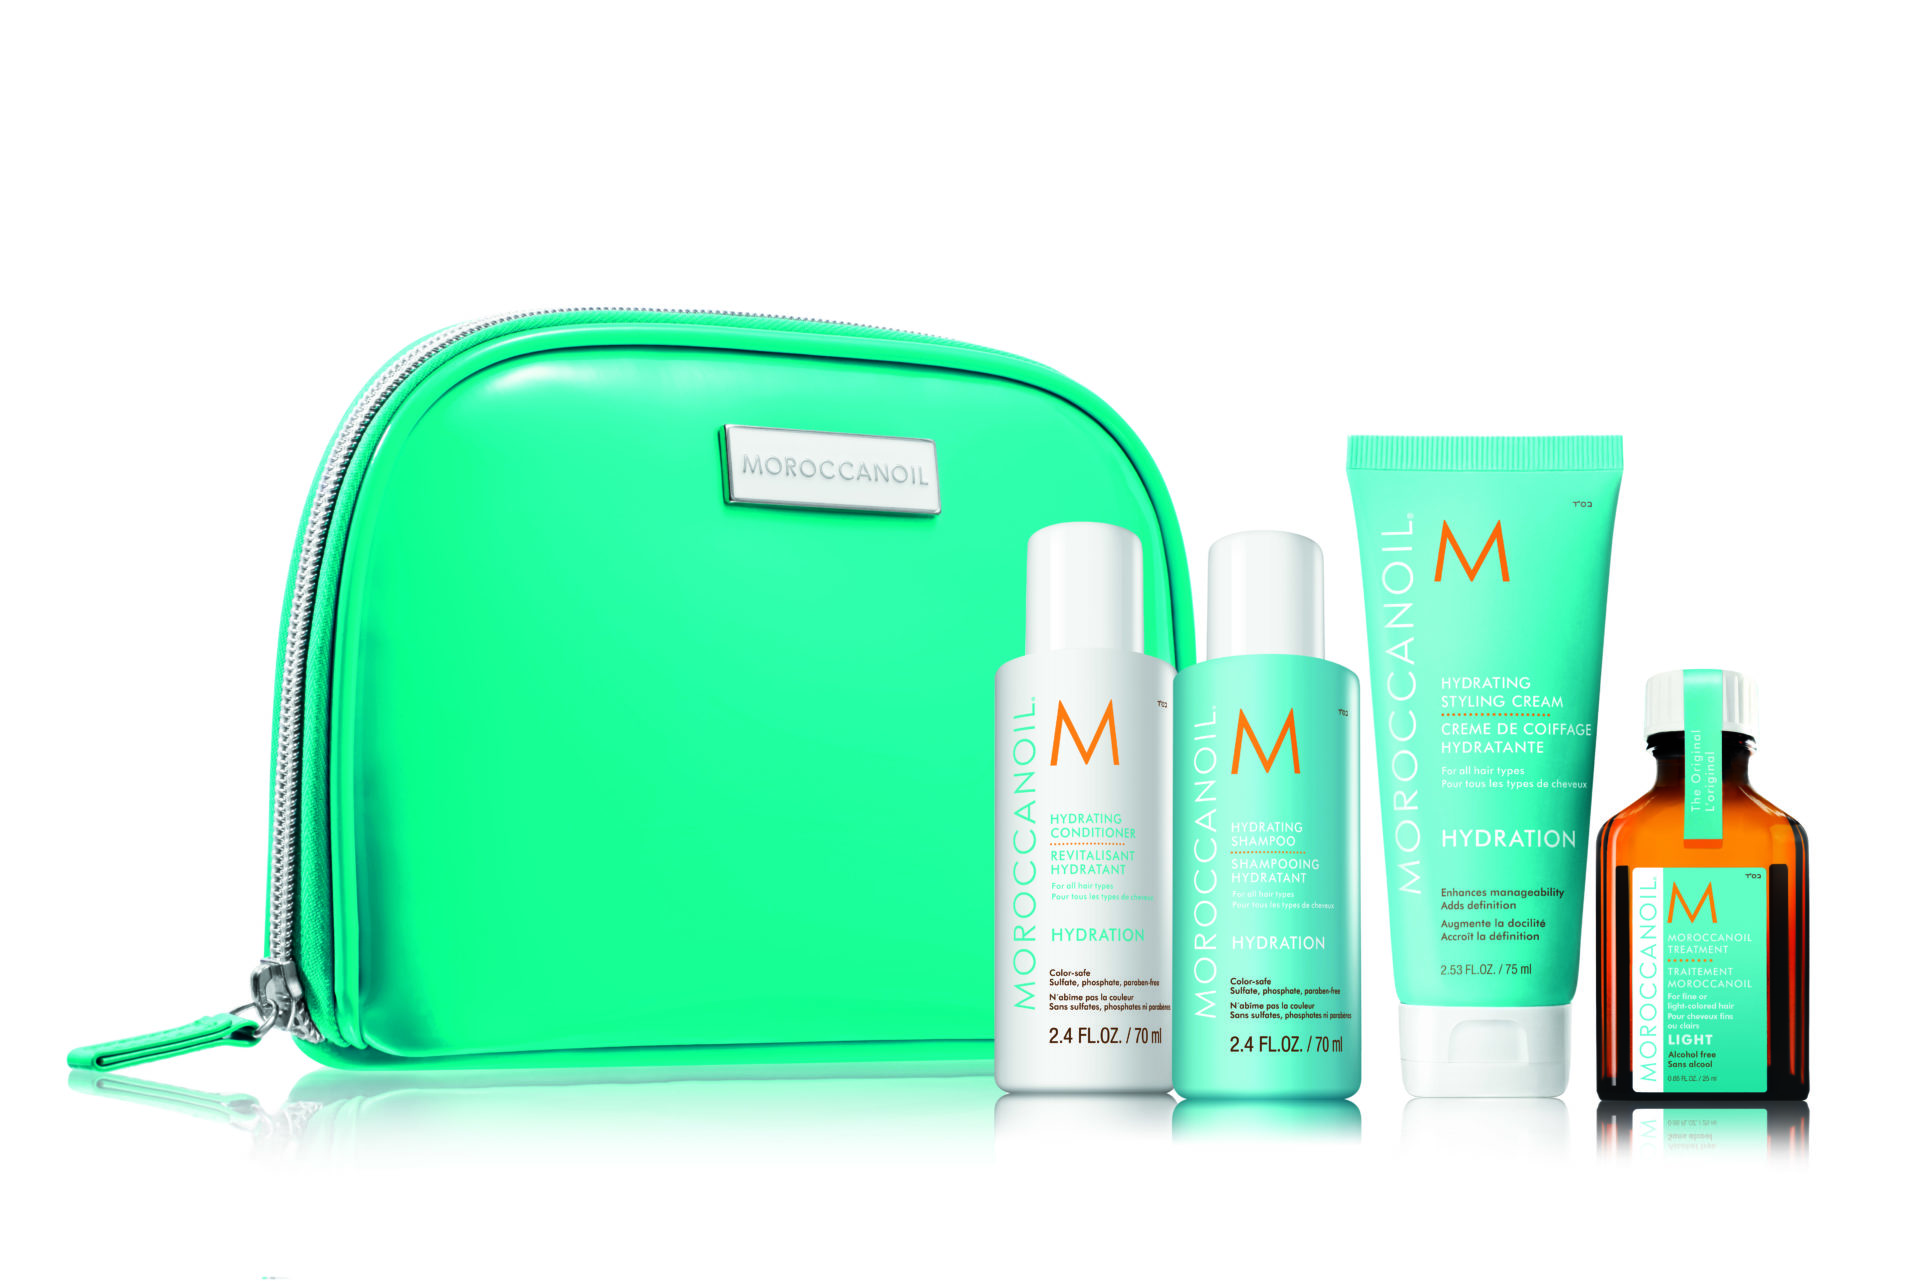 Moroccanoil Travel Bag Hair Care Gift Set Limerick Hair salons